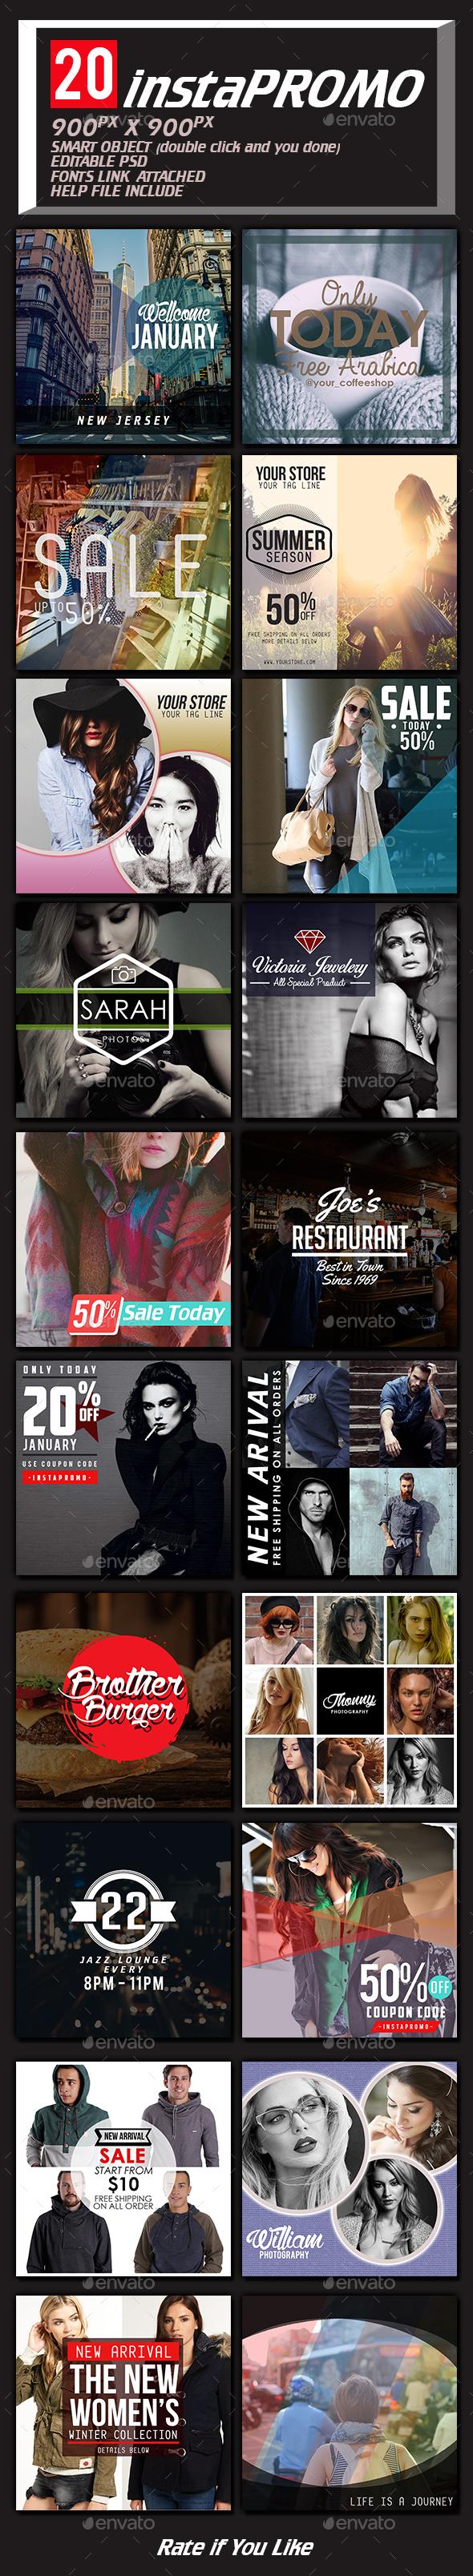 20 Instagram Templates - Social Media Web Elements